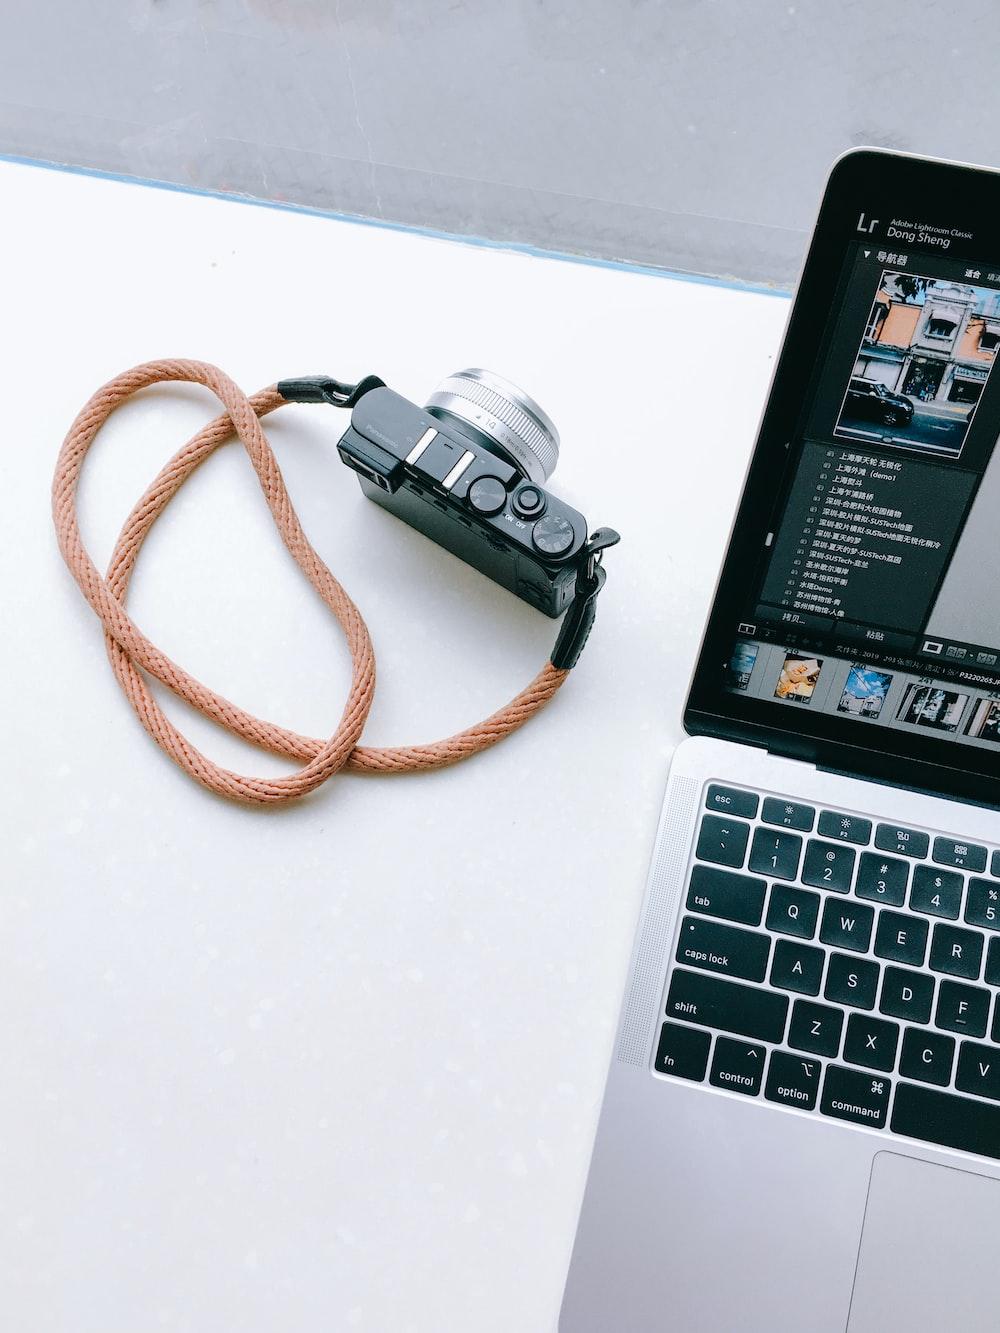 turned-on MacBook Pro near black and gray camera